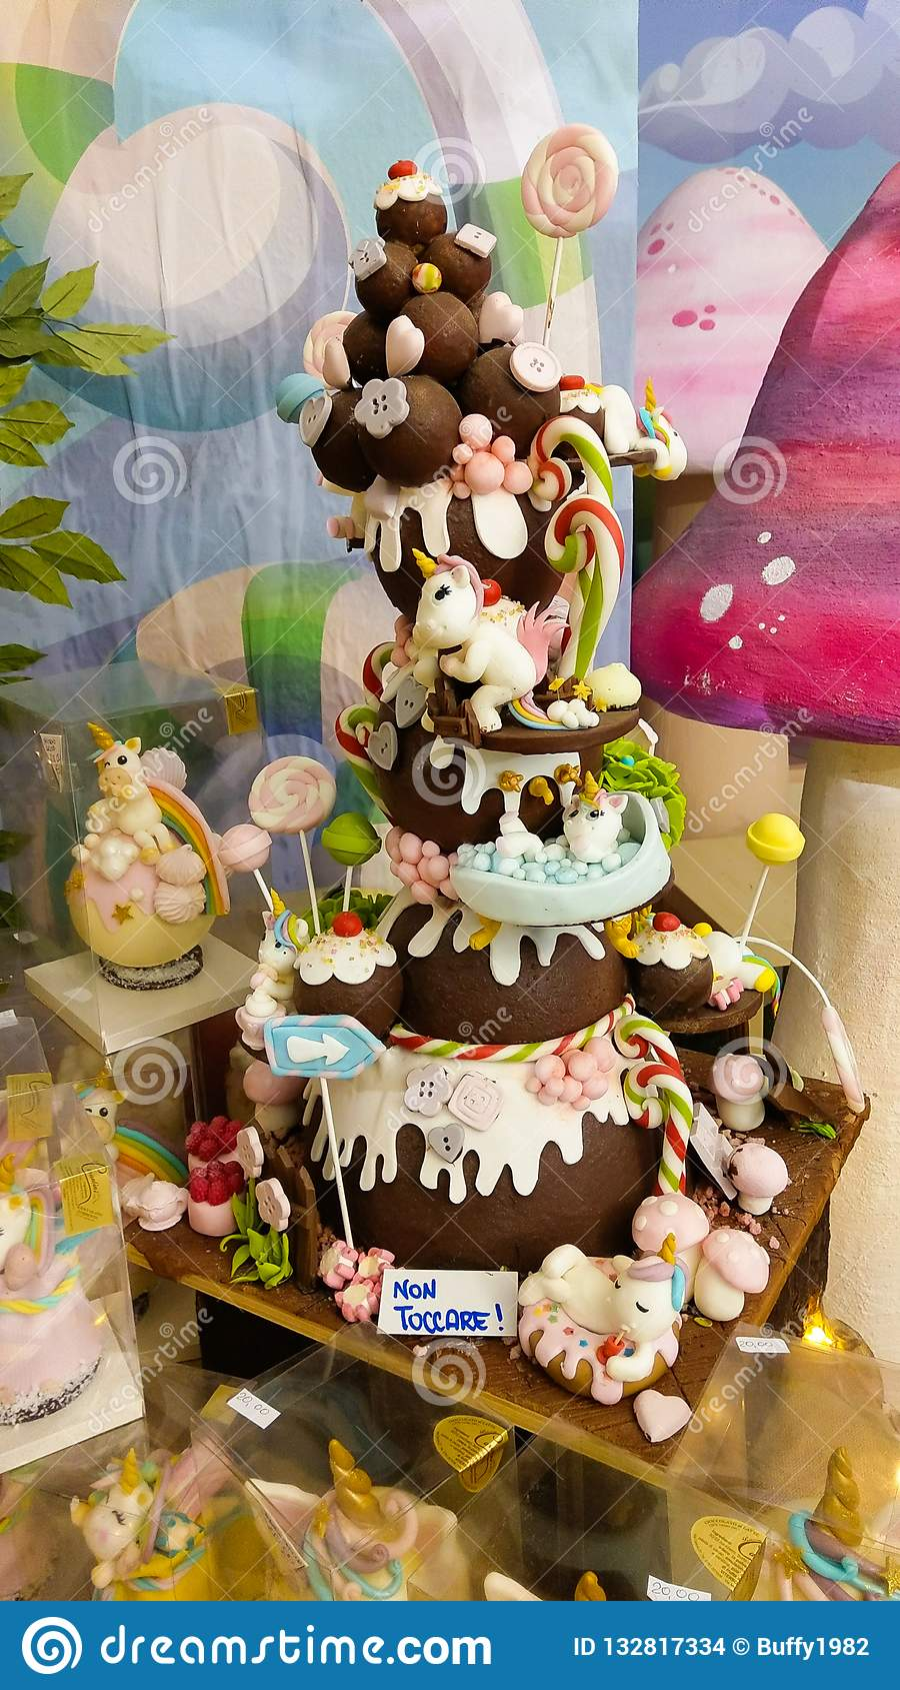 Wonderful cake with unicorn at the chocolate factory of Caffeina christmas village